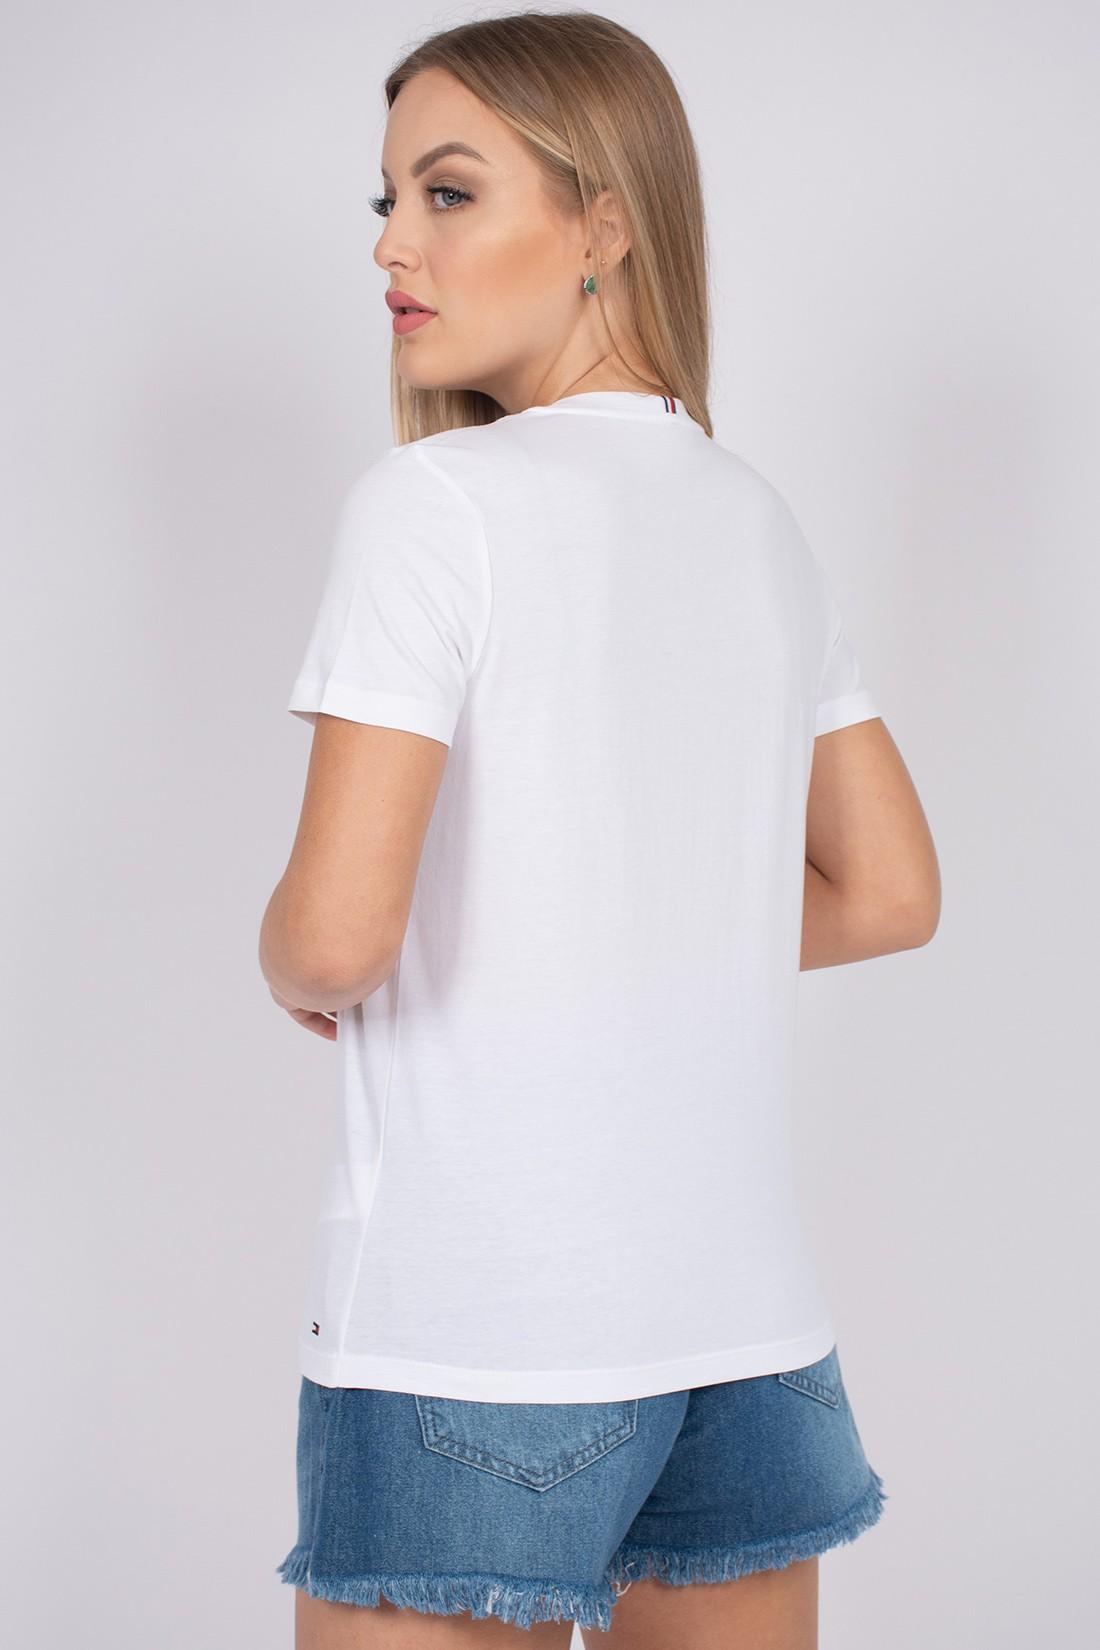 T Shirt Tommy Hilfiger Neck Graphic